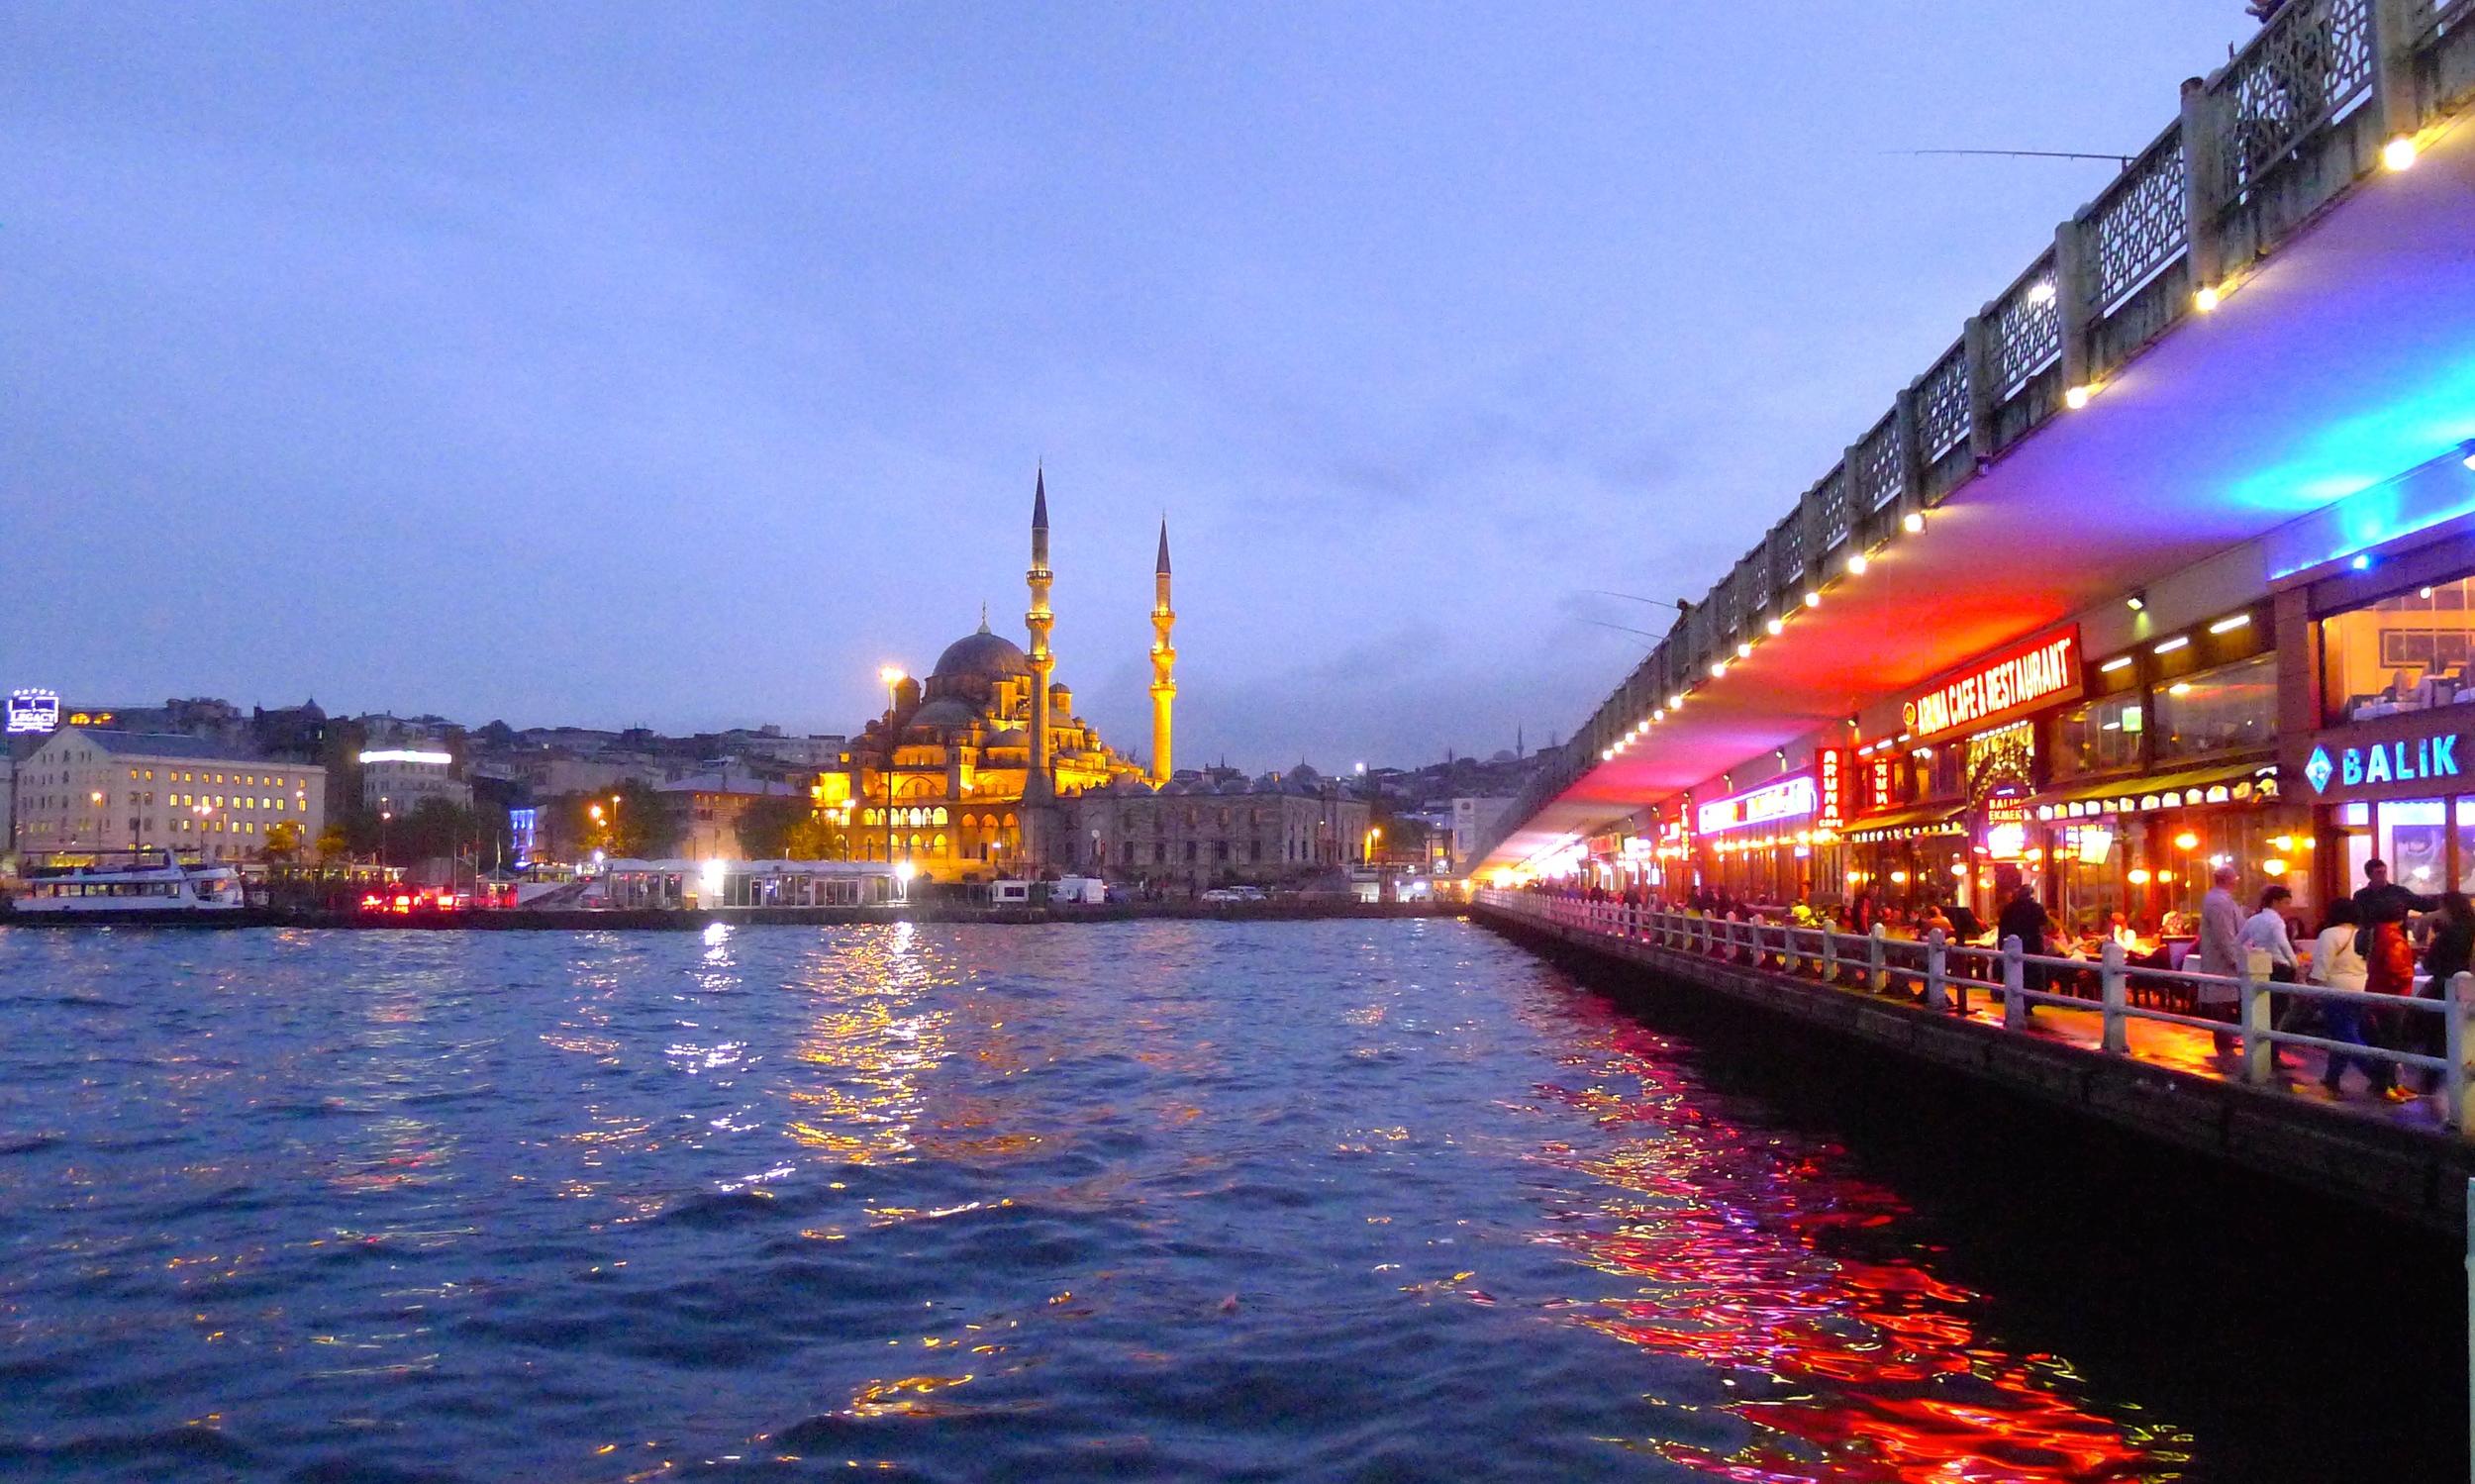 The Galata Bridge in Istanbul, Turkey.